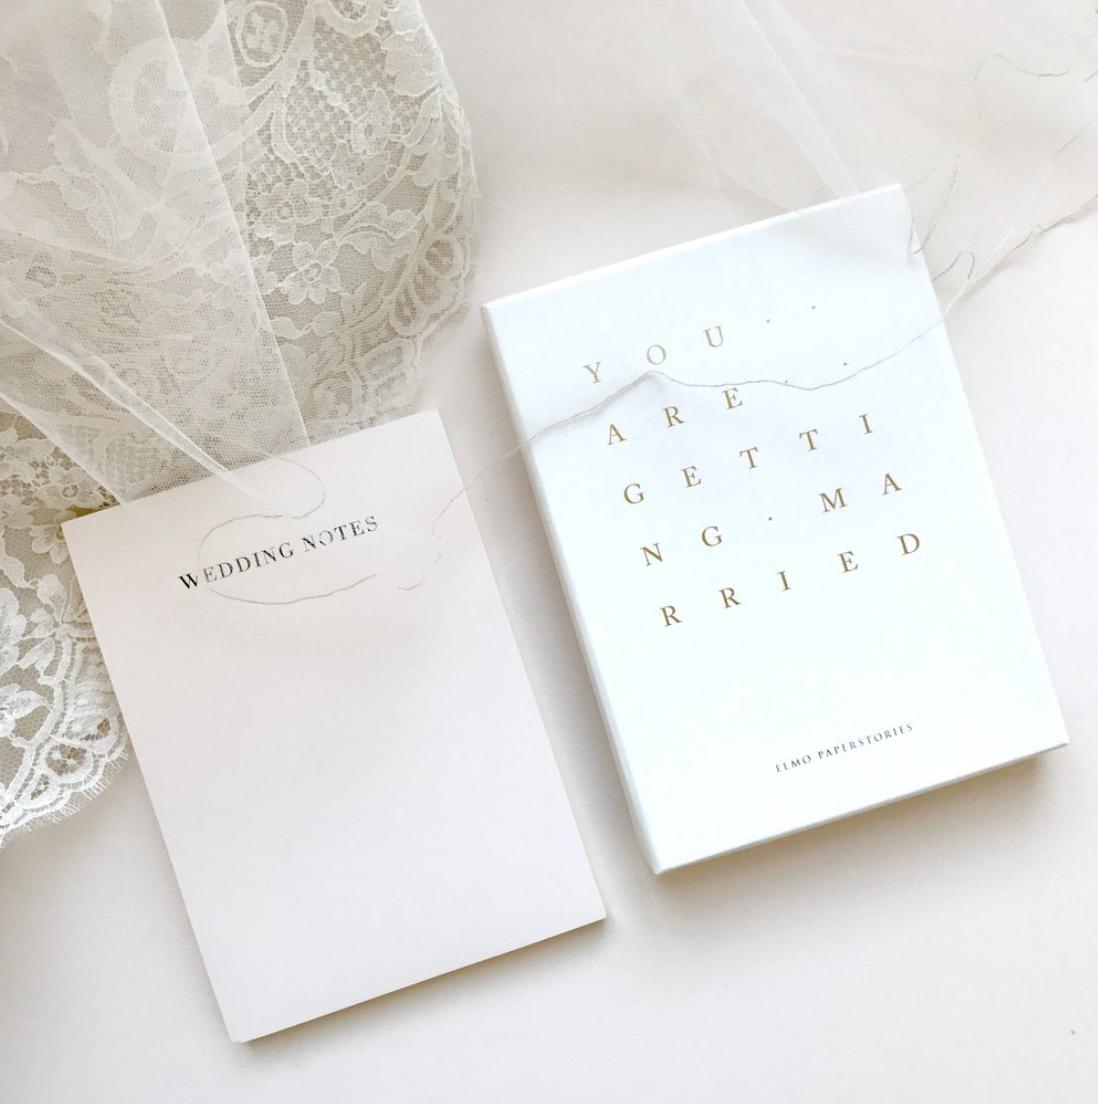 Top 10 Reasons To Hire A Wedding Planner - WeddingPlanner.co.uk